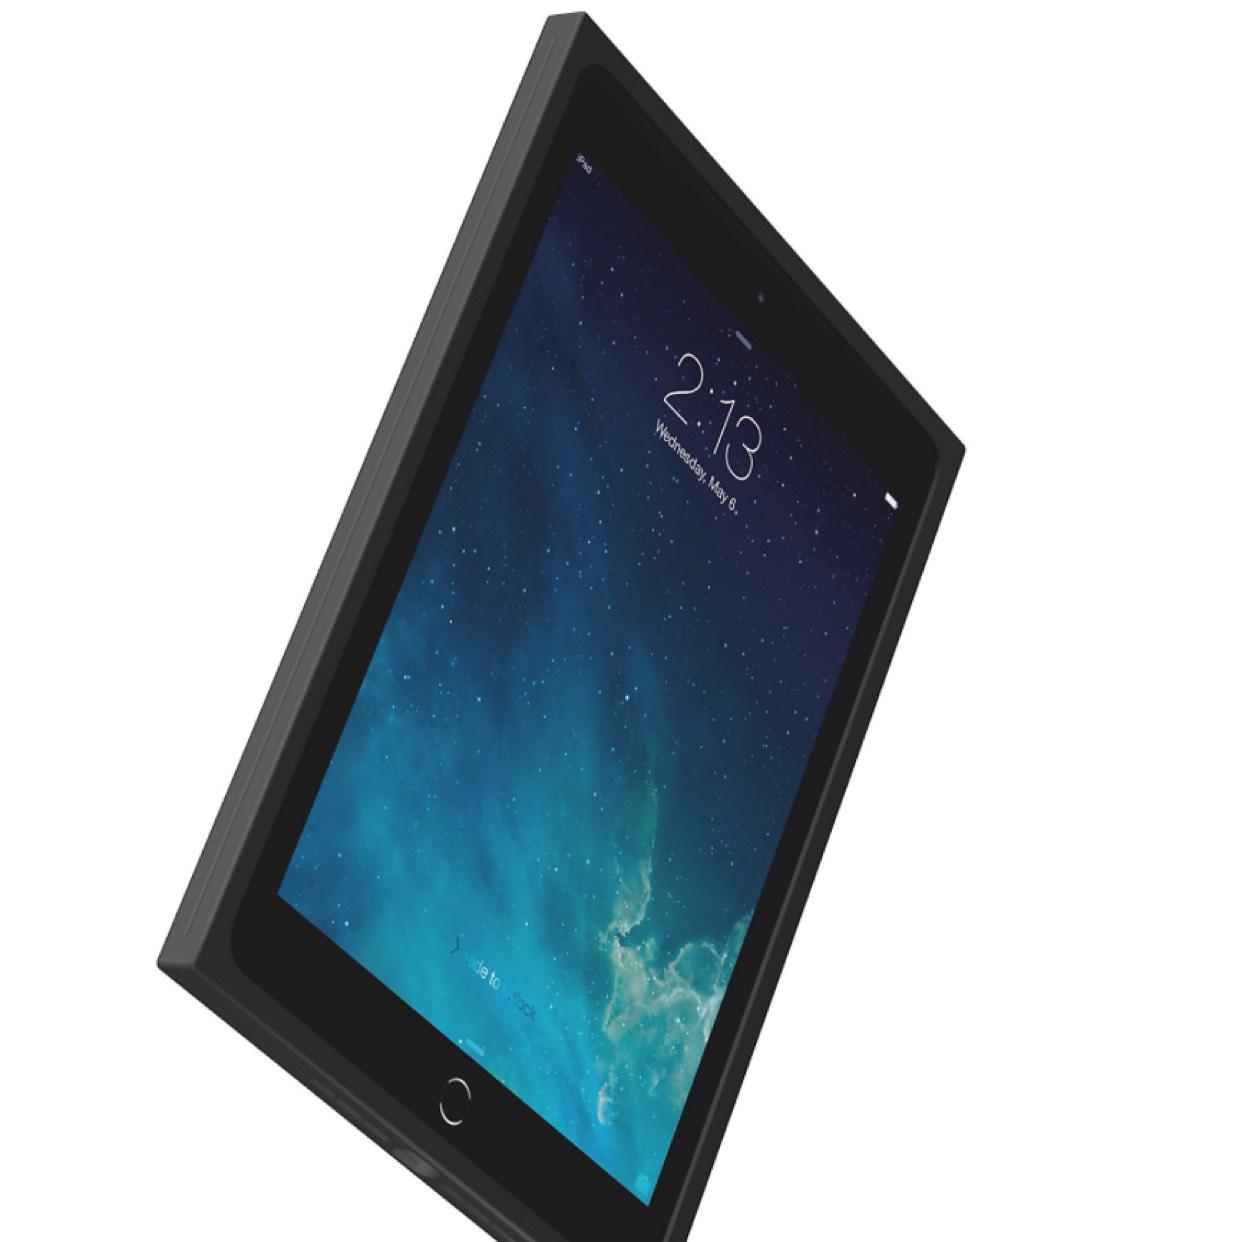 [Cyberport] Logitech BLOK Schutzhülle für iPad Air 2 Farbe BLACK/RED